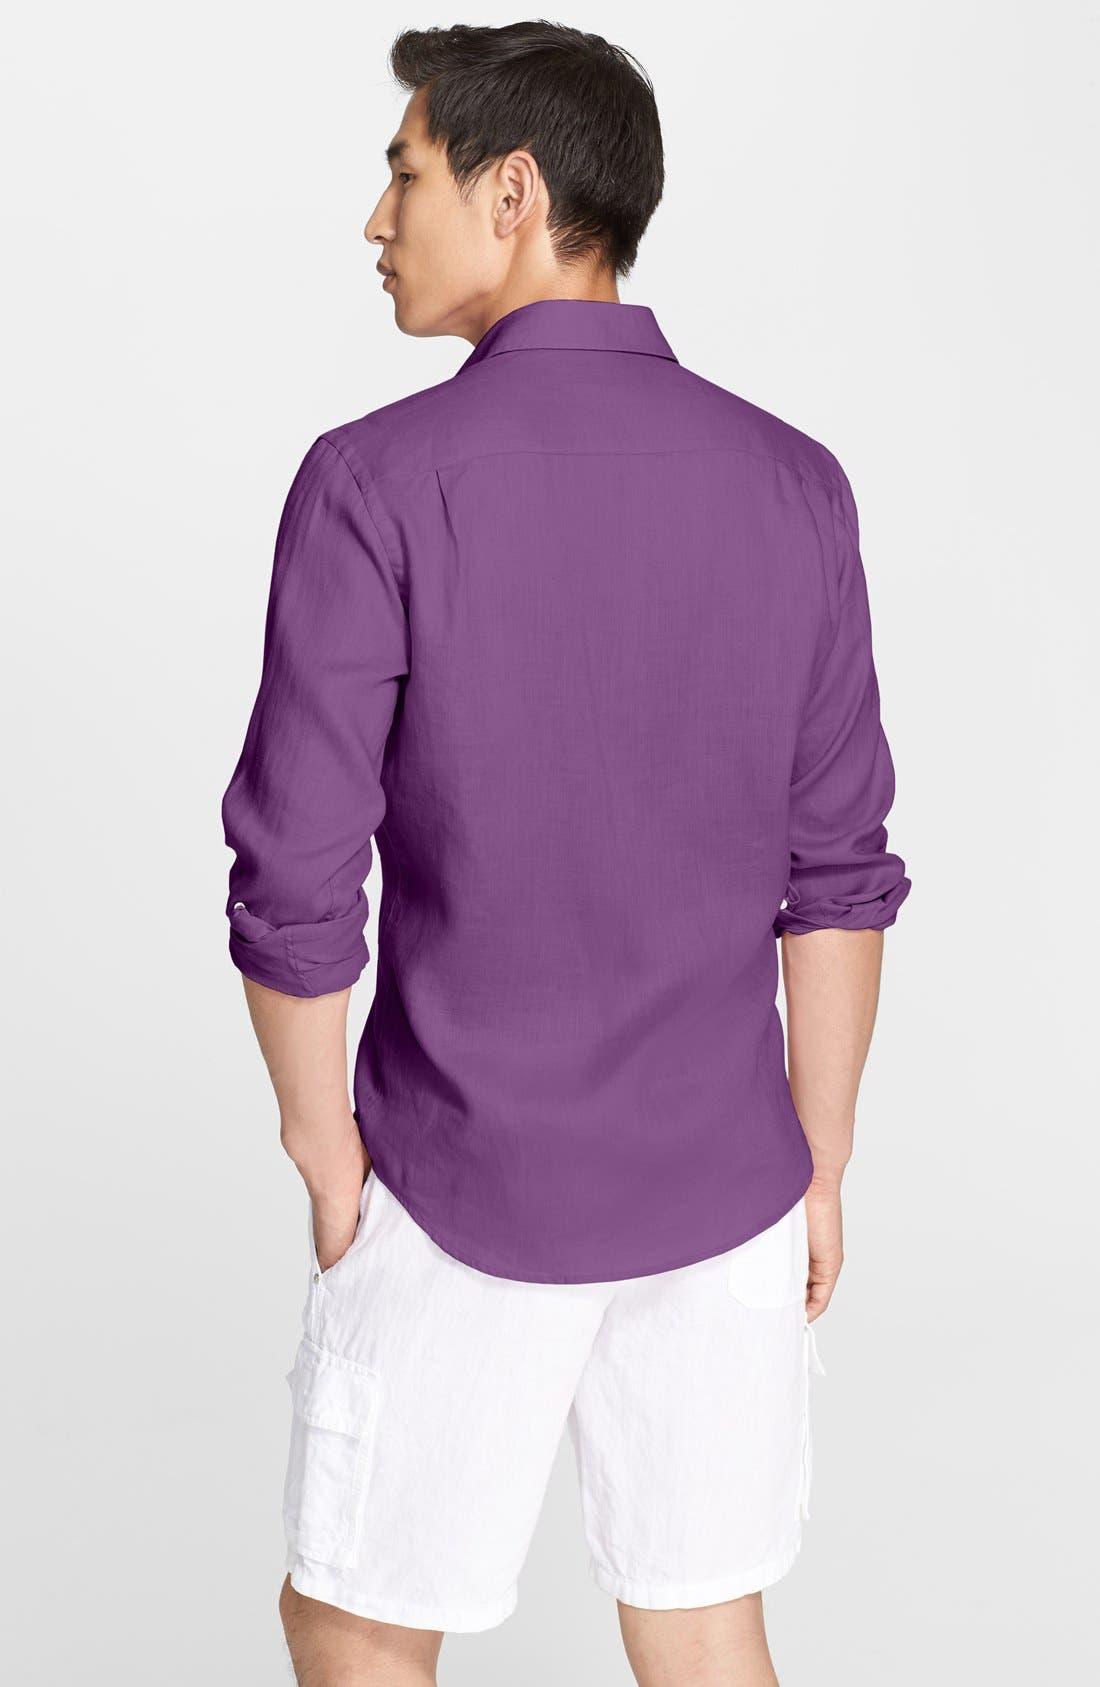 'Caroubier' Linen Shirt,                             Alternate thumbnail 27, color,